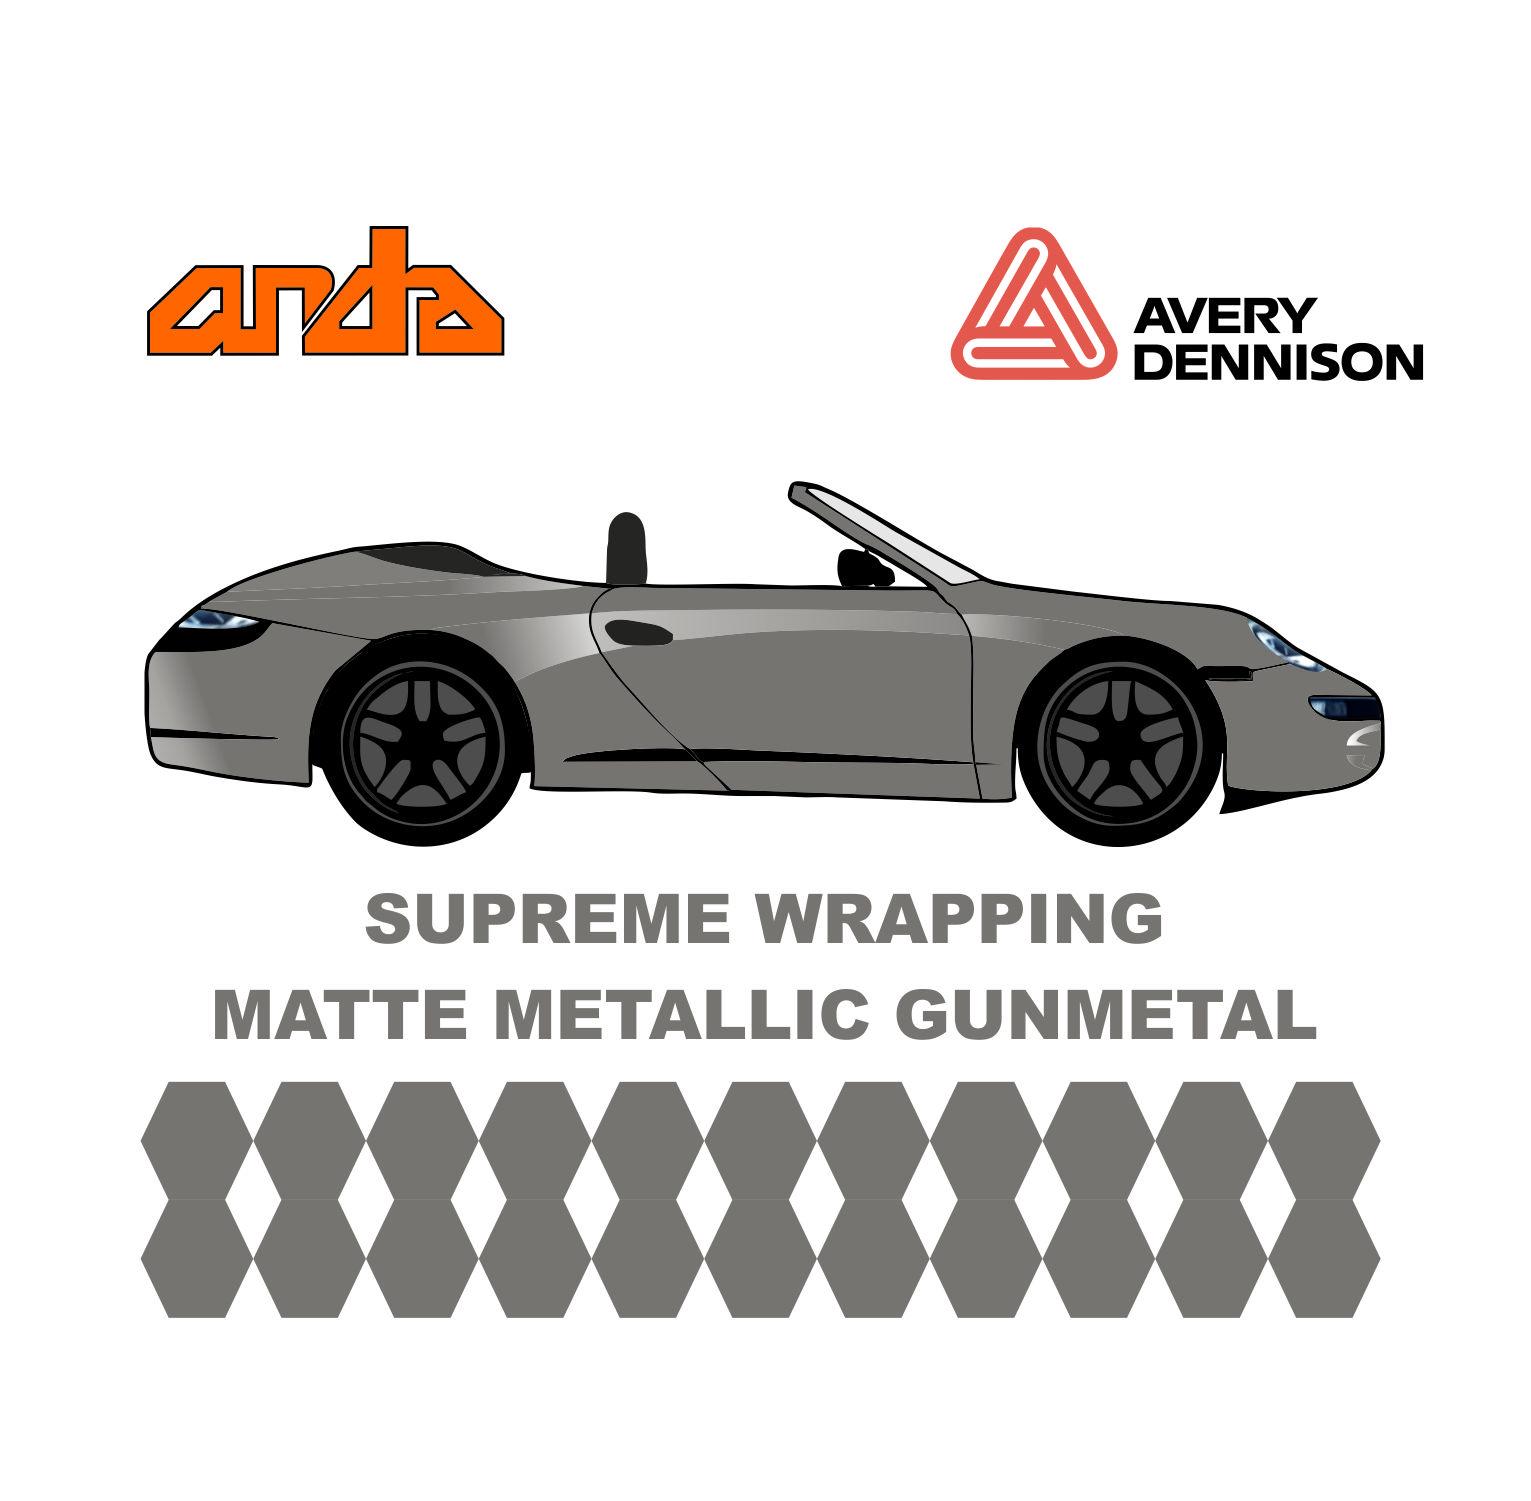 Avery Dennison- SWF Matte Metallic Gunmetal 1